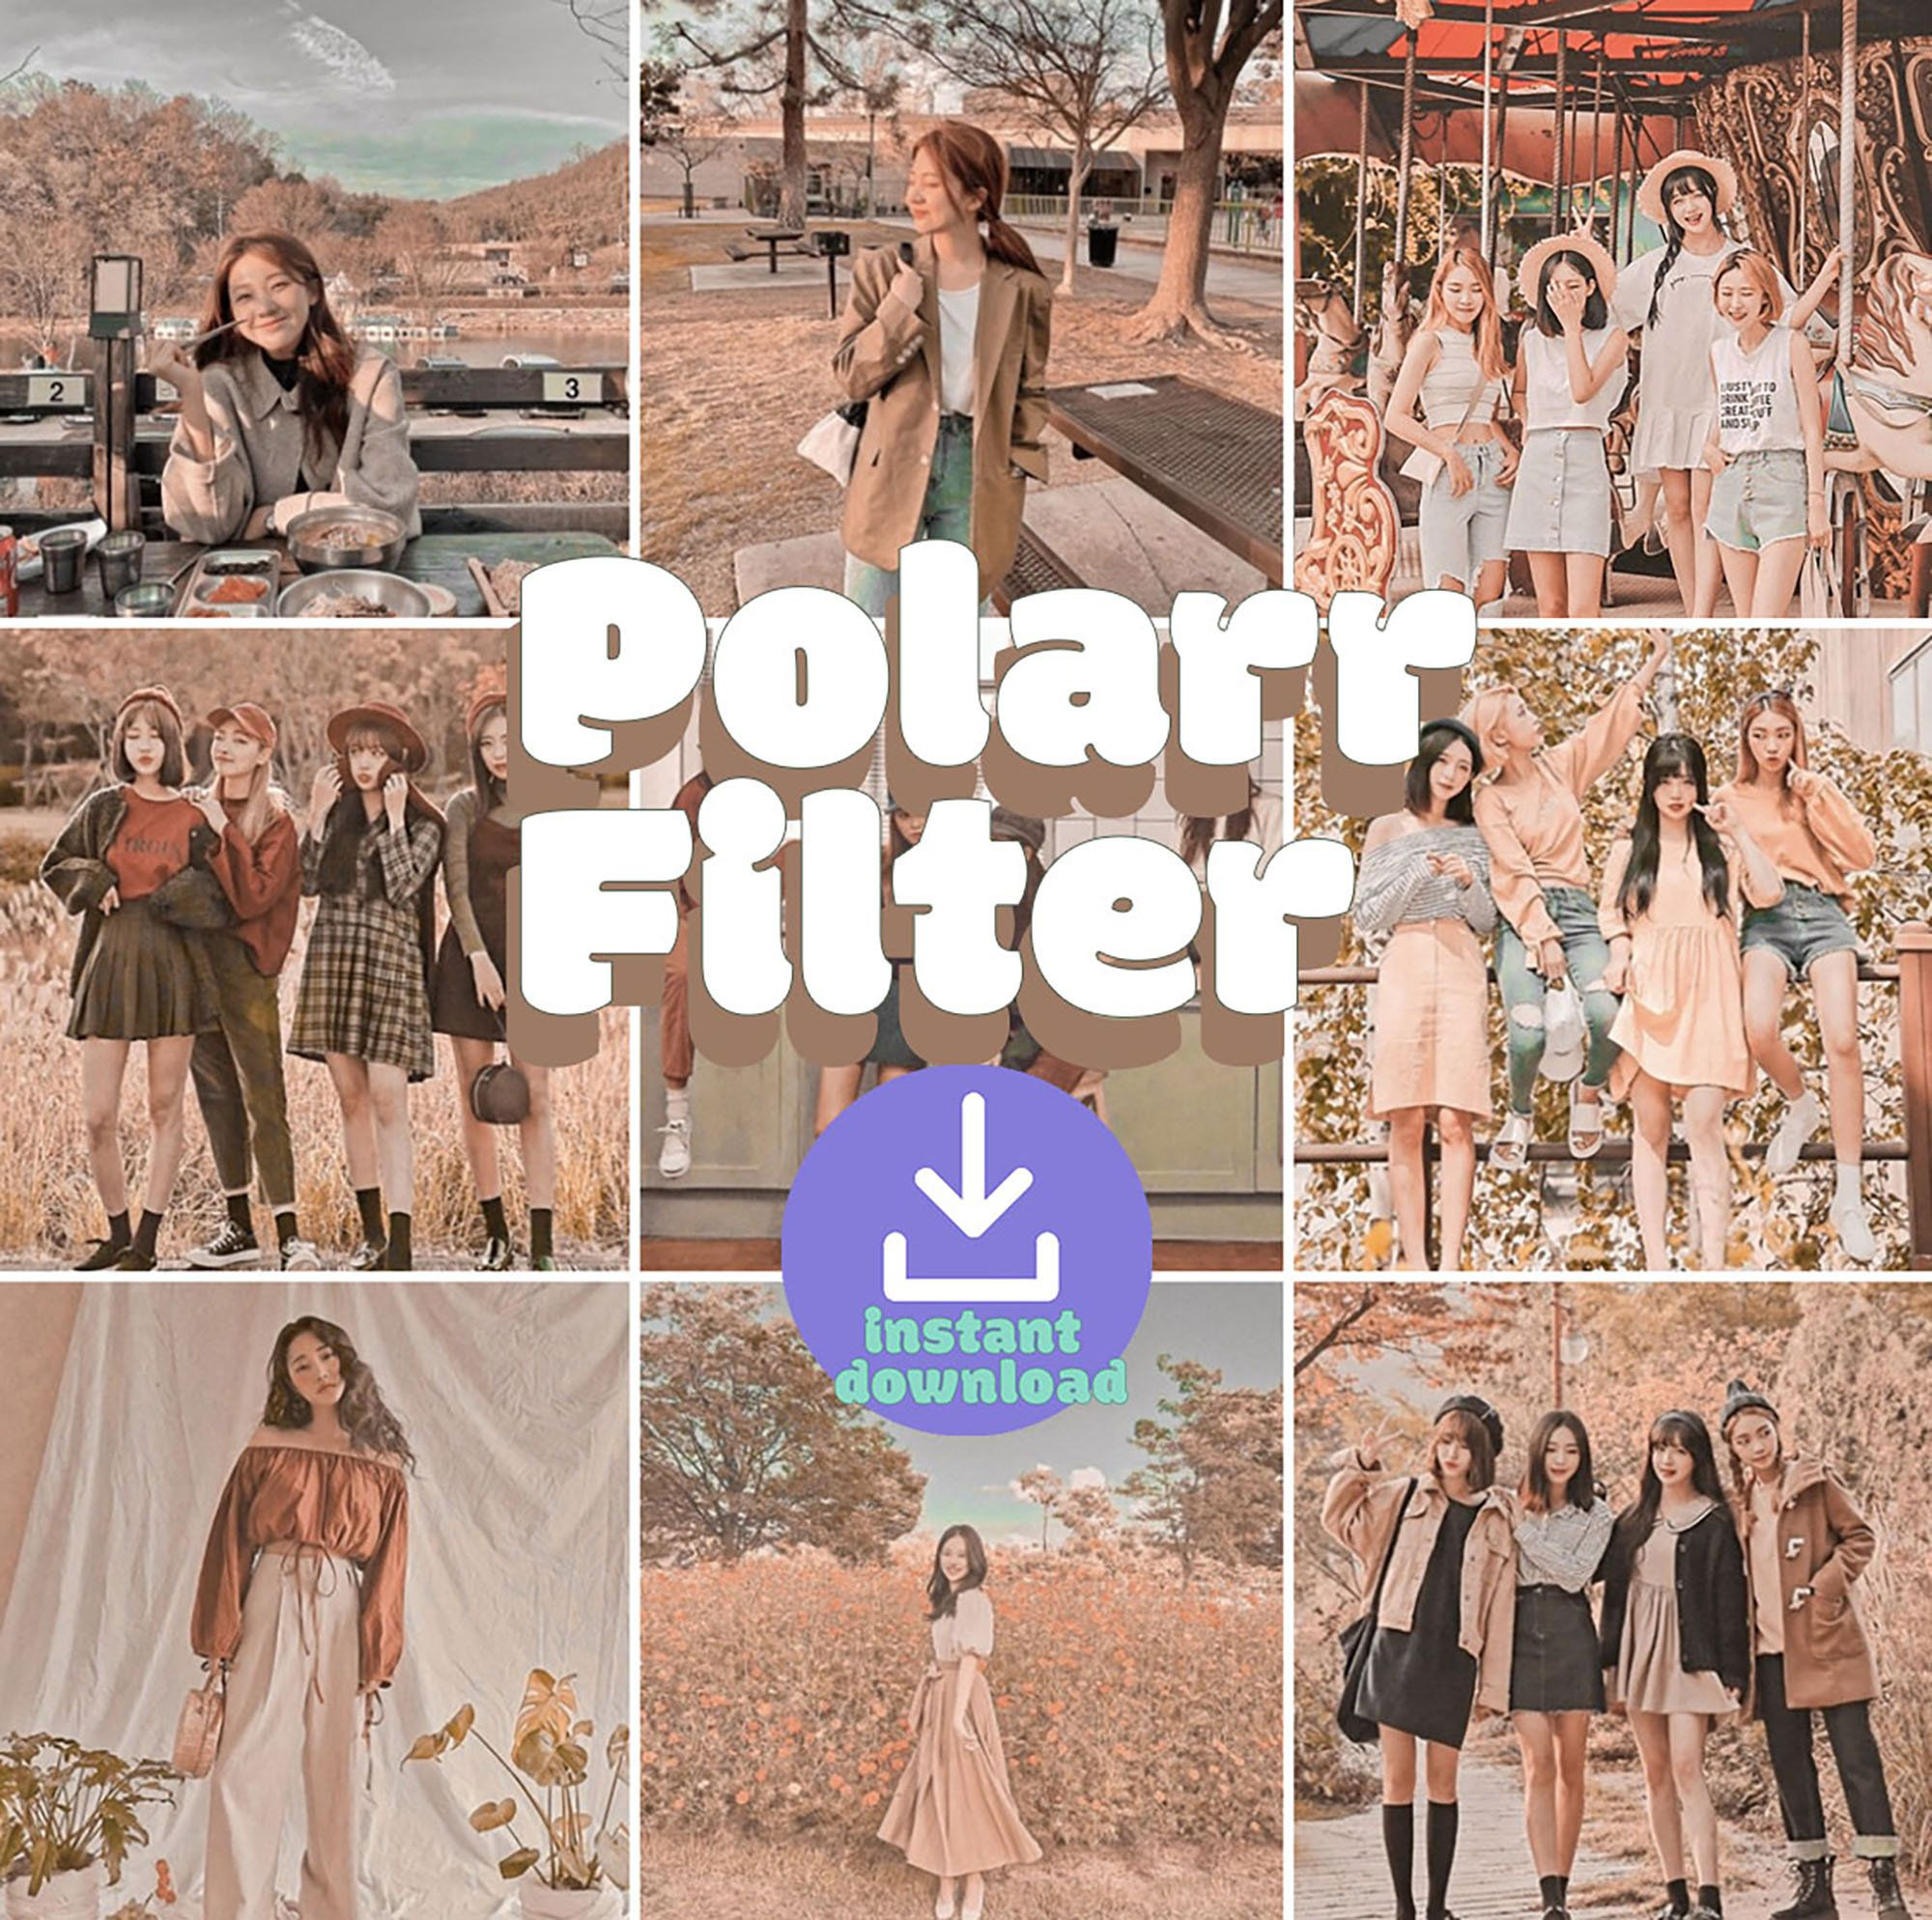 Polarr Filters Polarr Code Filter Instant Download Color Preset For Polarr Photo Editor Vintage In 2020 Photo Editing Apps Photo Editing Free Photo Editing